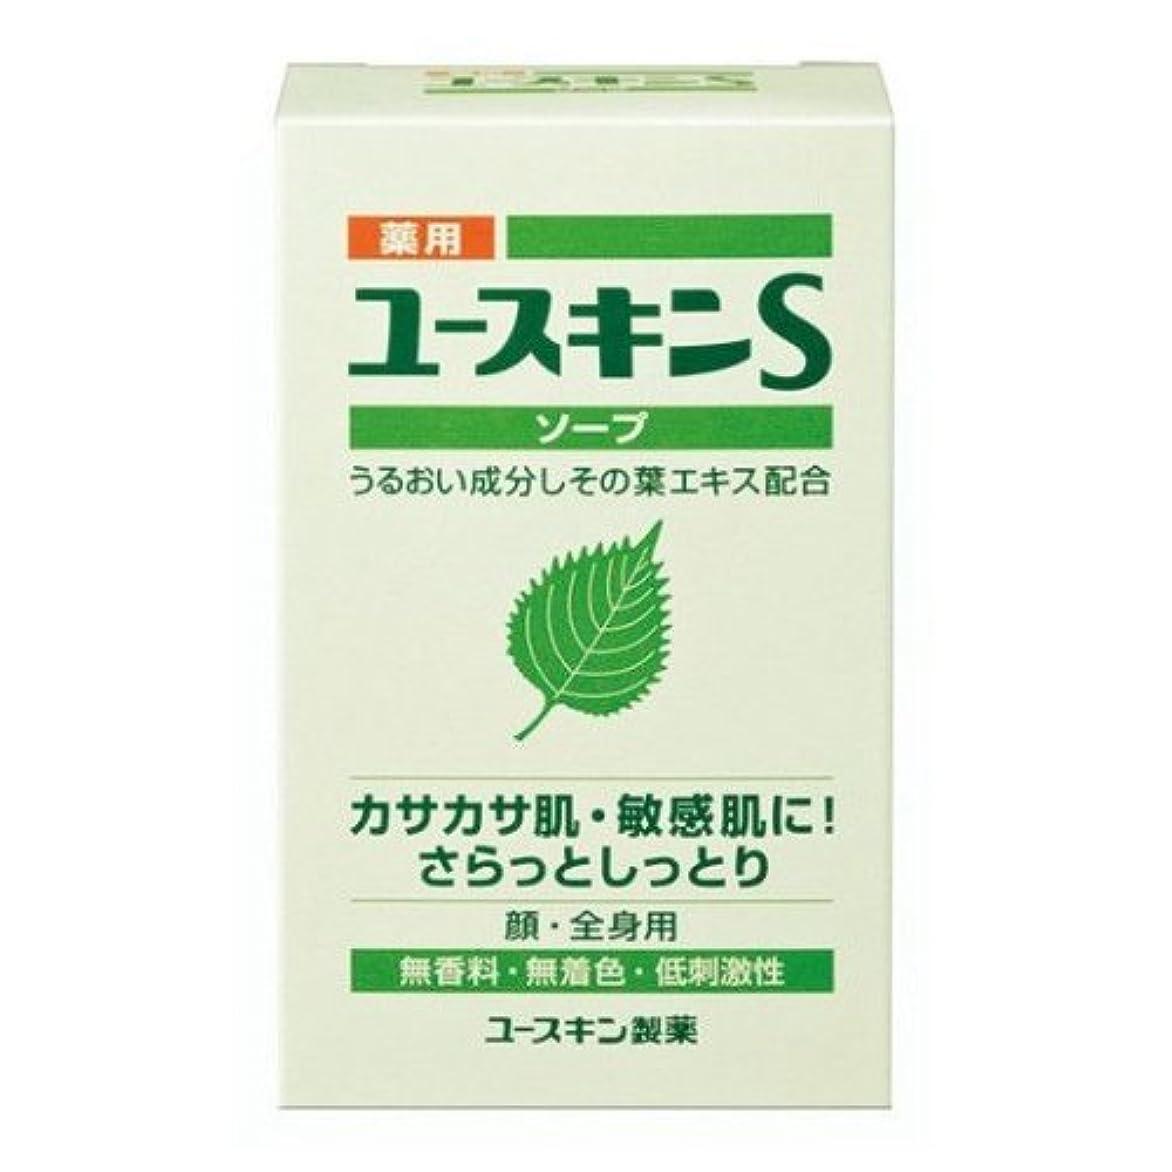 囚人消去教育者薬用ユースキンS ソープ 90g (敏感肌用 透明石鹸) 【医薬部外品】